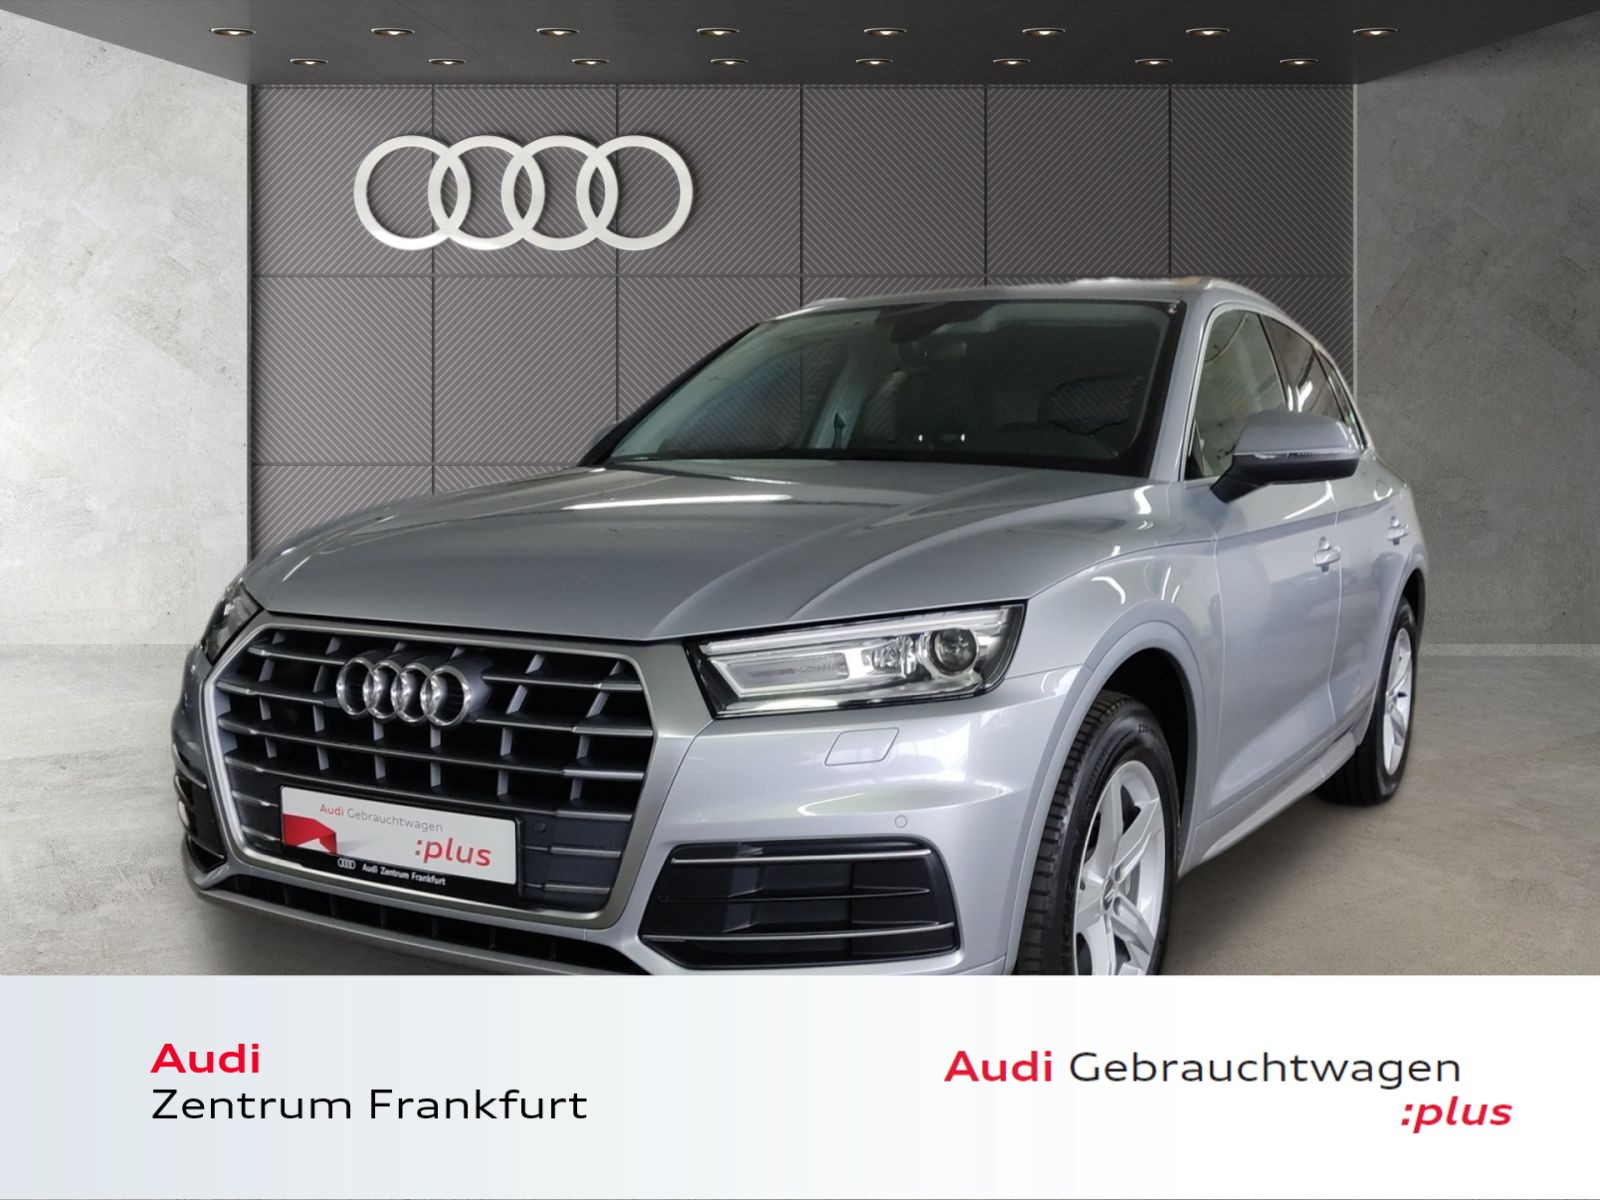 Audi Q5 2.0 TDI sport Navi Xenon Tempomat PDC Sitzheizung, Jahr 2018, Diesel